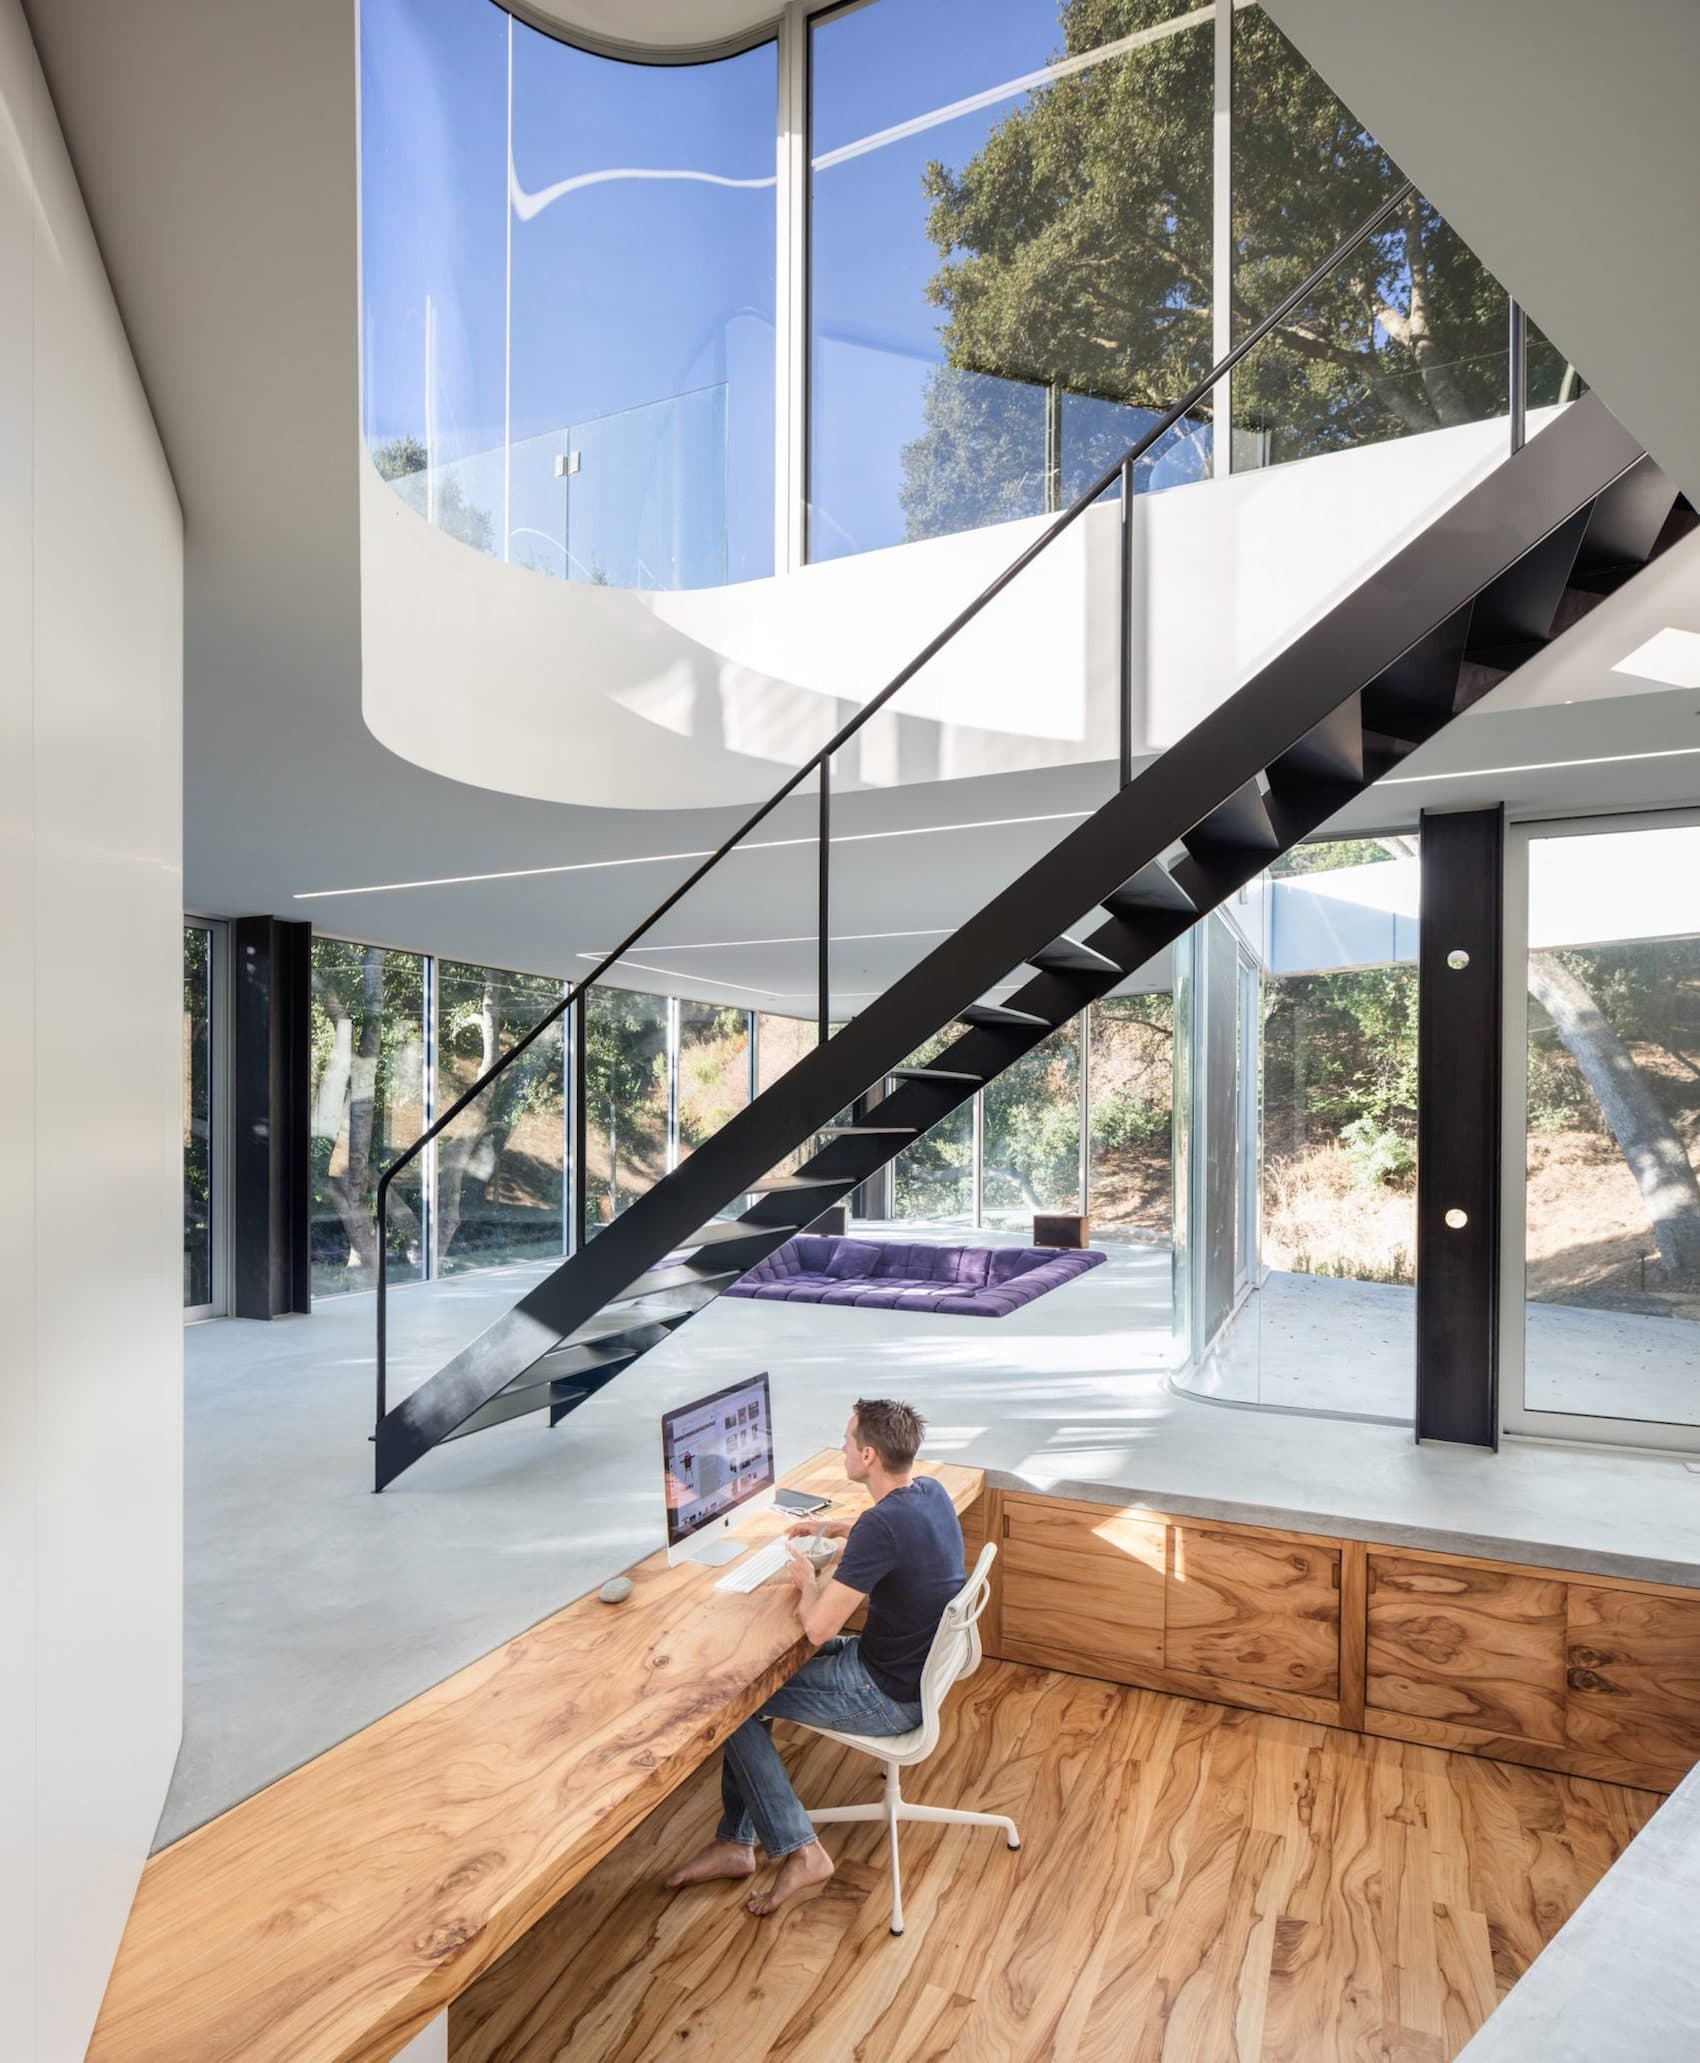 Licht ist Leben: Pam & Paul's House by Craig Steely Architecture 6